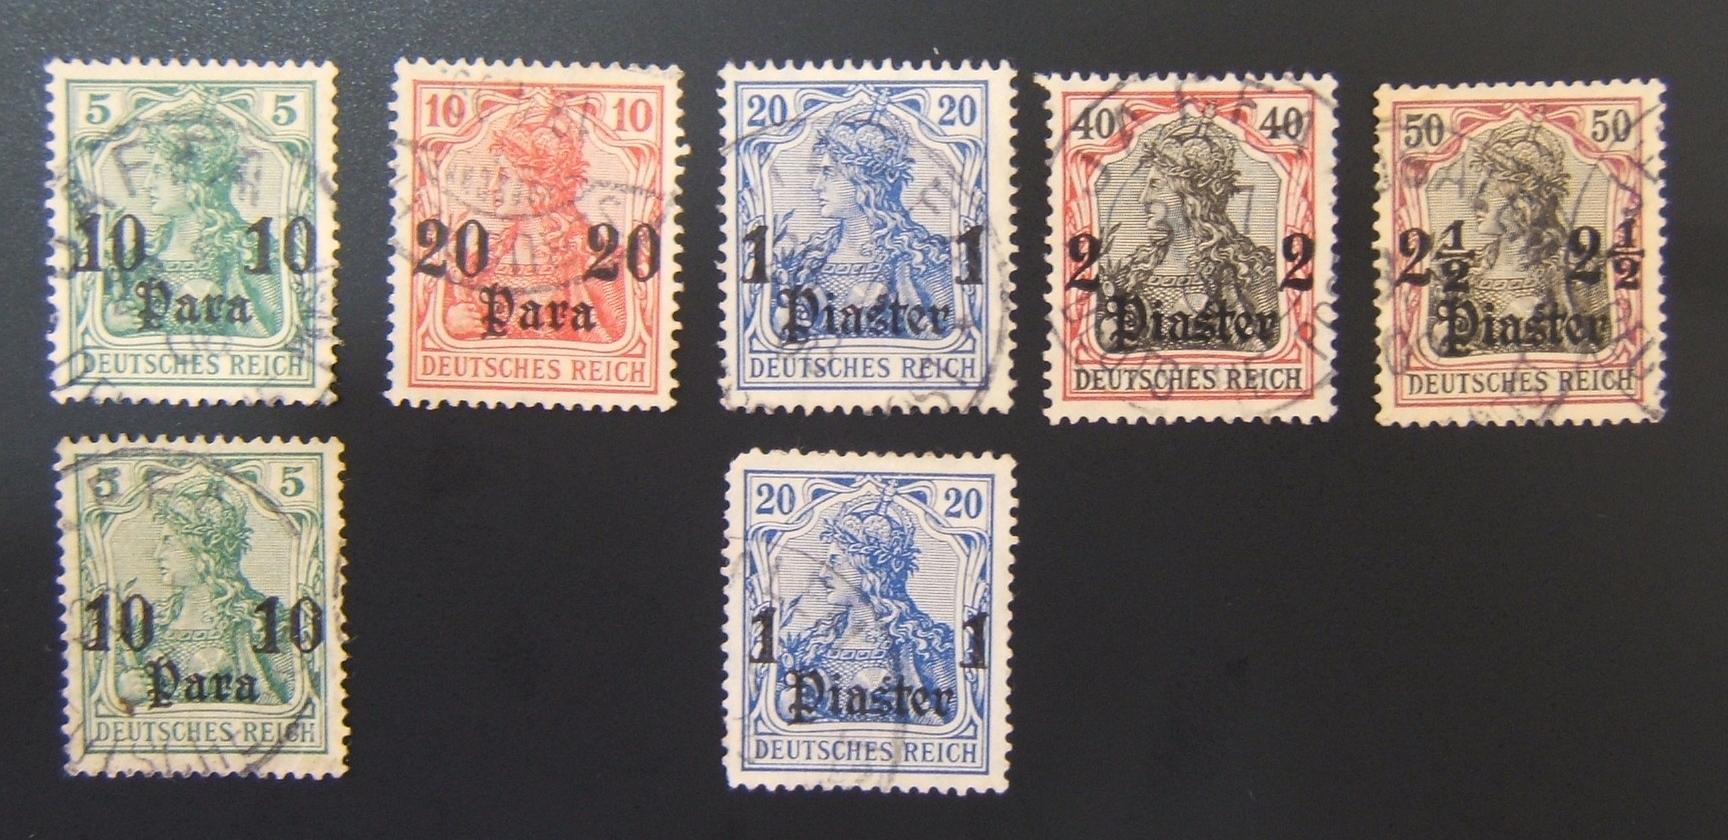 German Holyland Post: lot x7 Jer. & Jaffa pmkd Deutsches Reich stps w/wmk